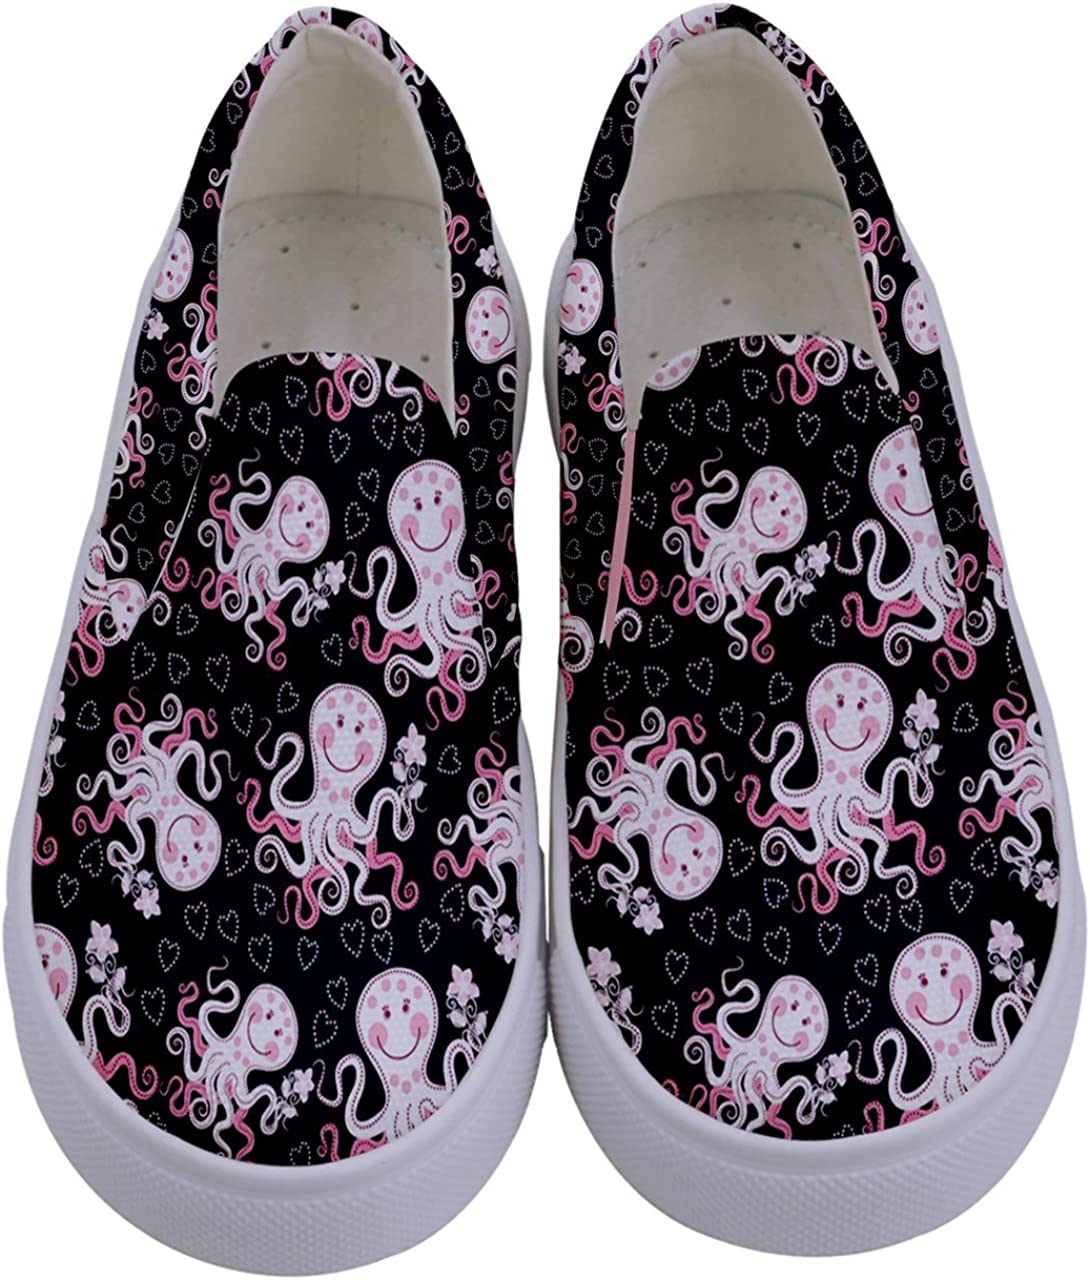 PattyCandy Girls Sea Animals Pattern Kids Canvas Slip-On Shoes, Size:US 8C-7Y